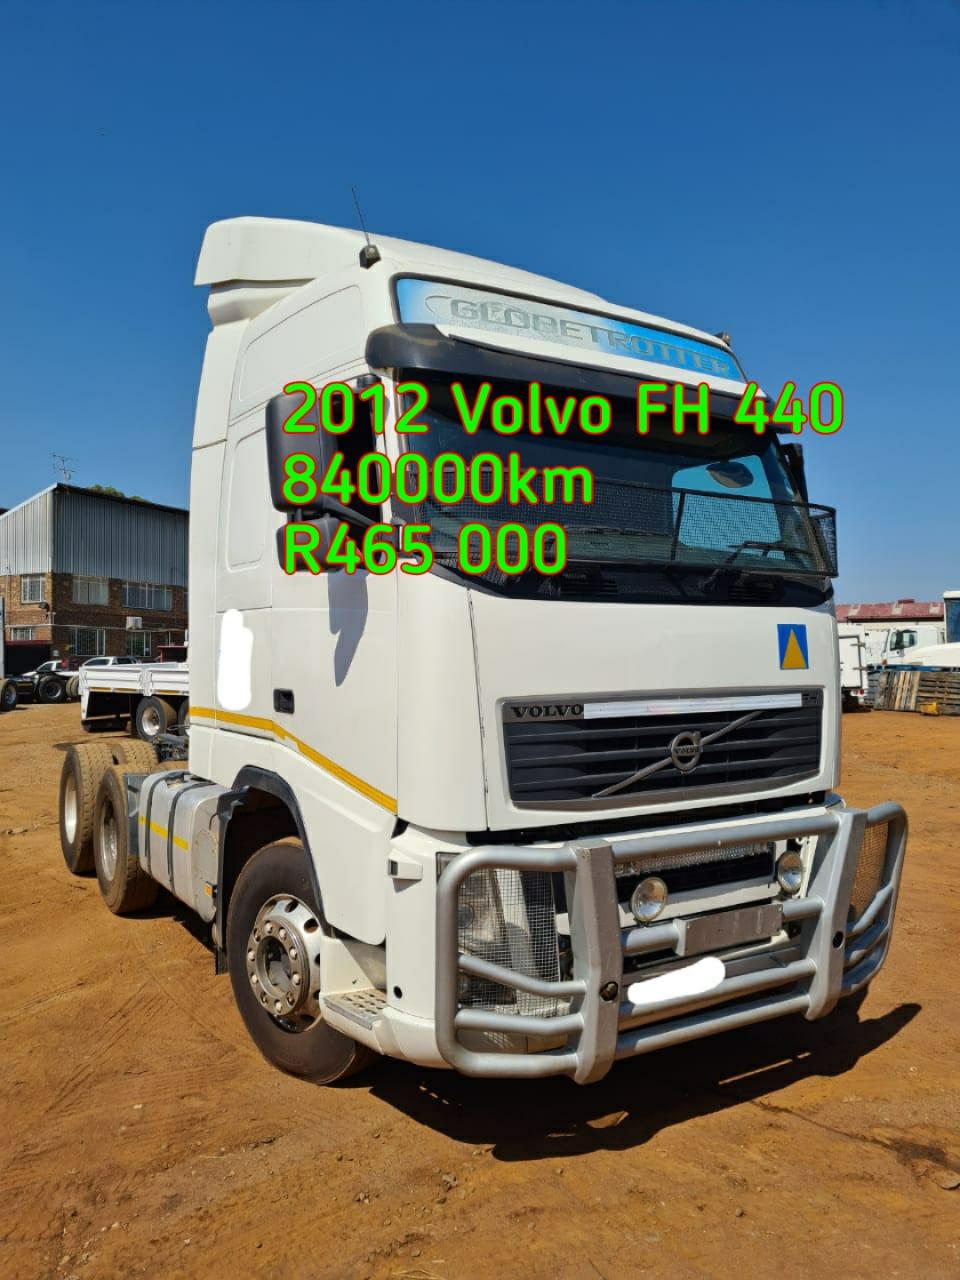 2012 Volvo FH440